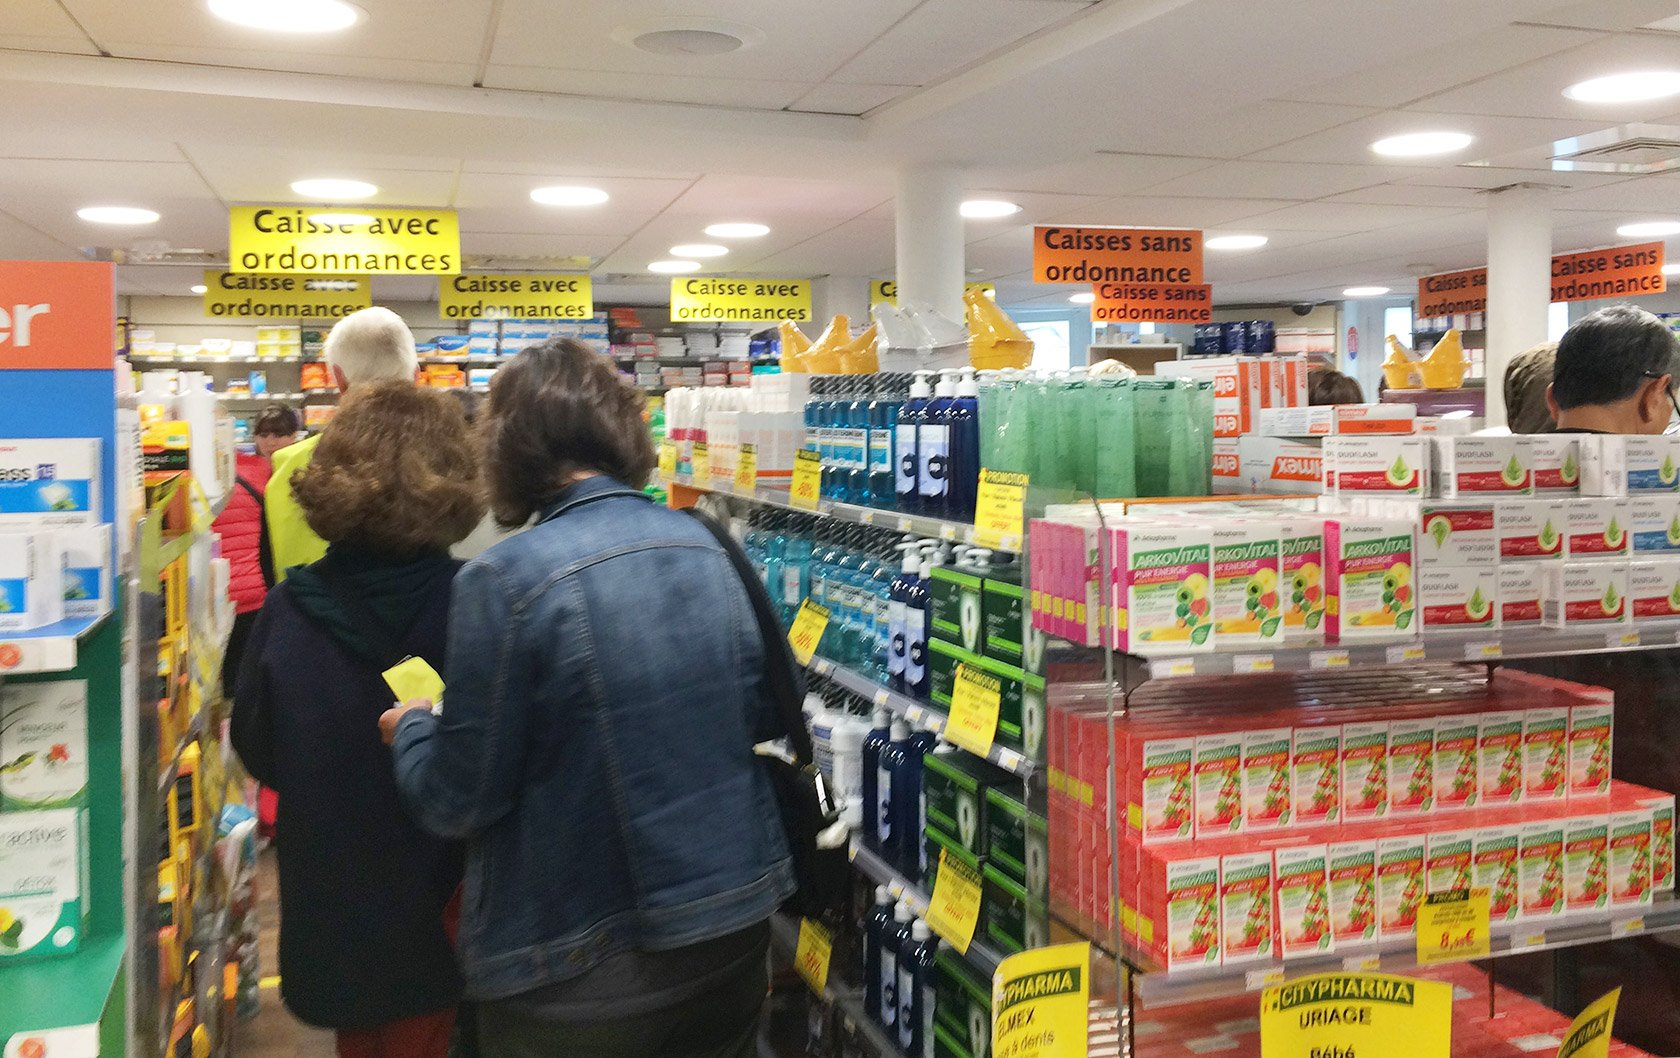 city-pharma-lines-upstairs